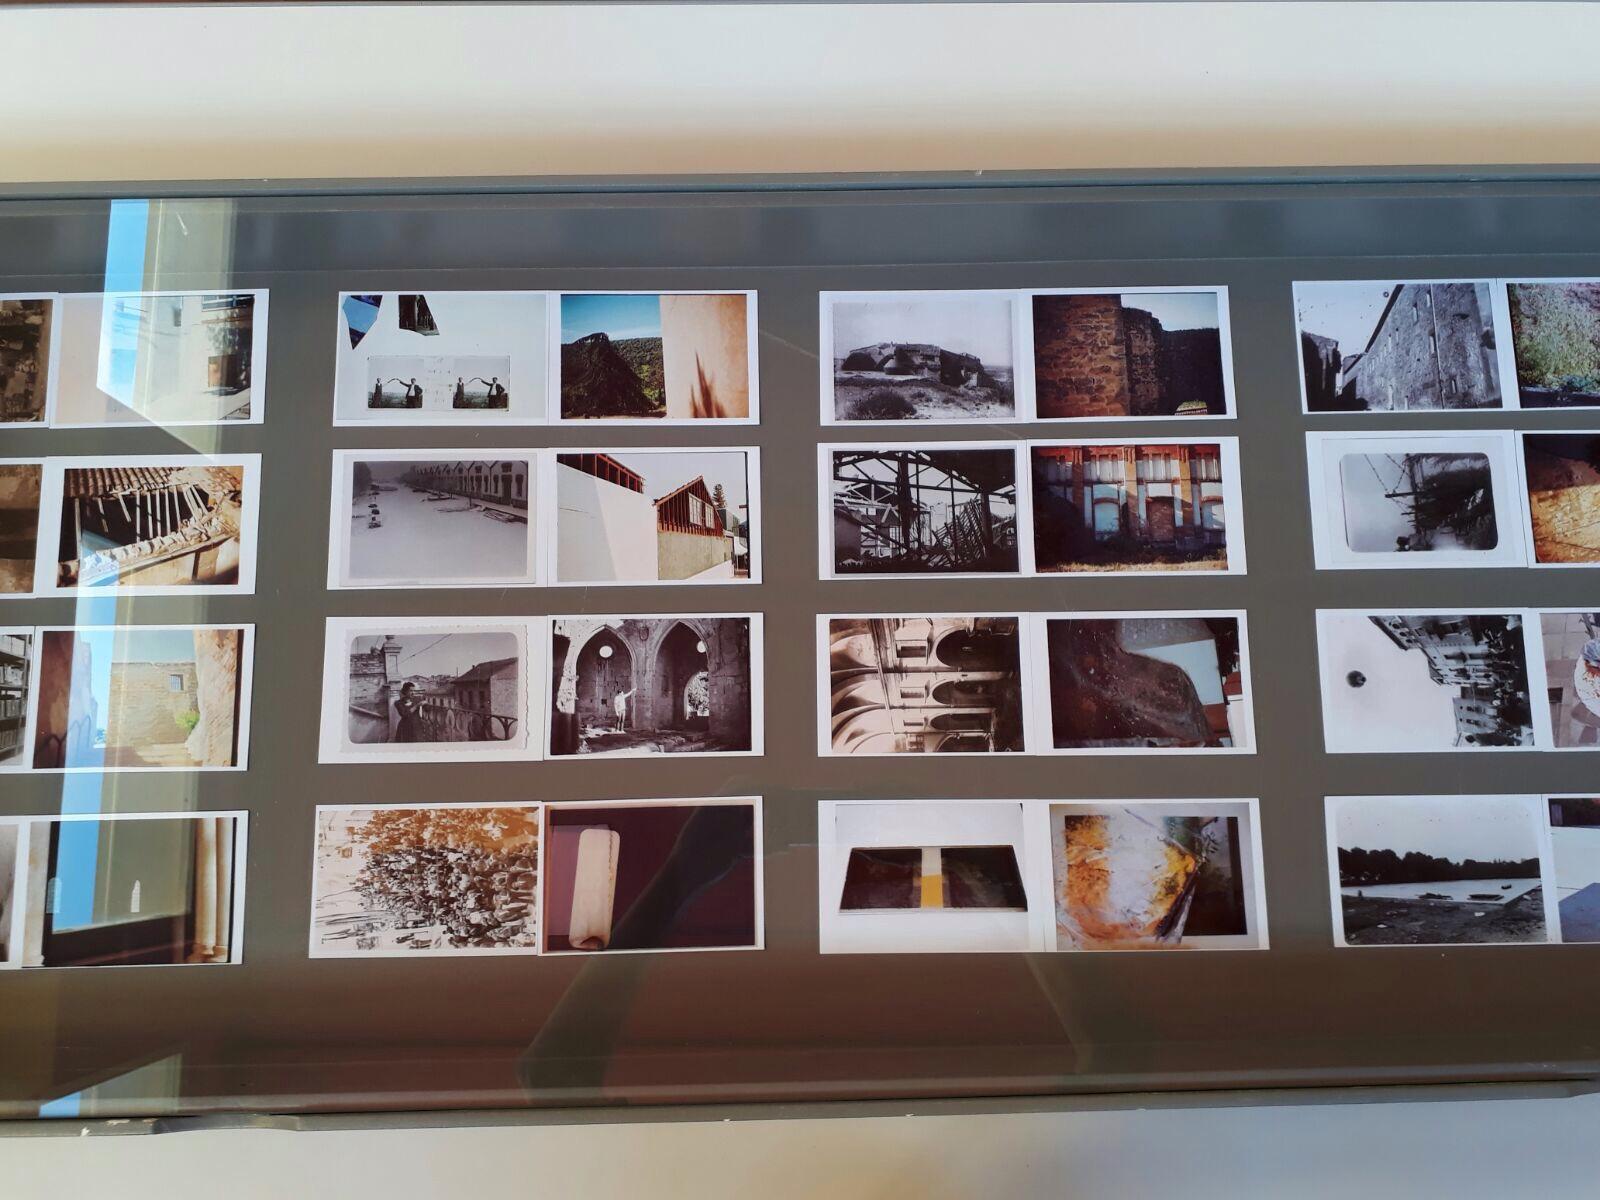 Interweaving Archives - Installation documentation